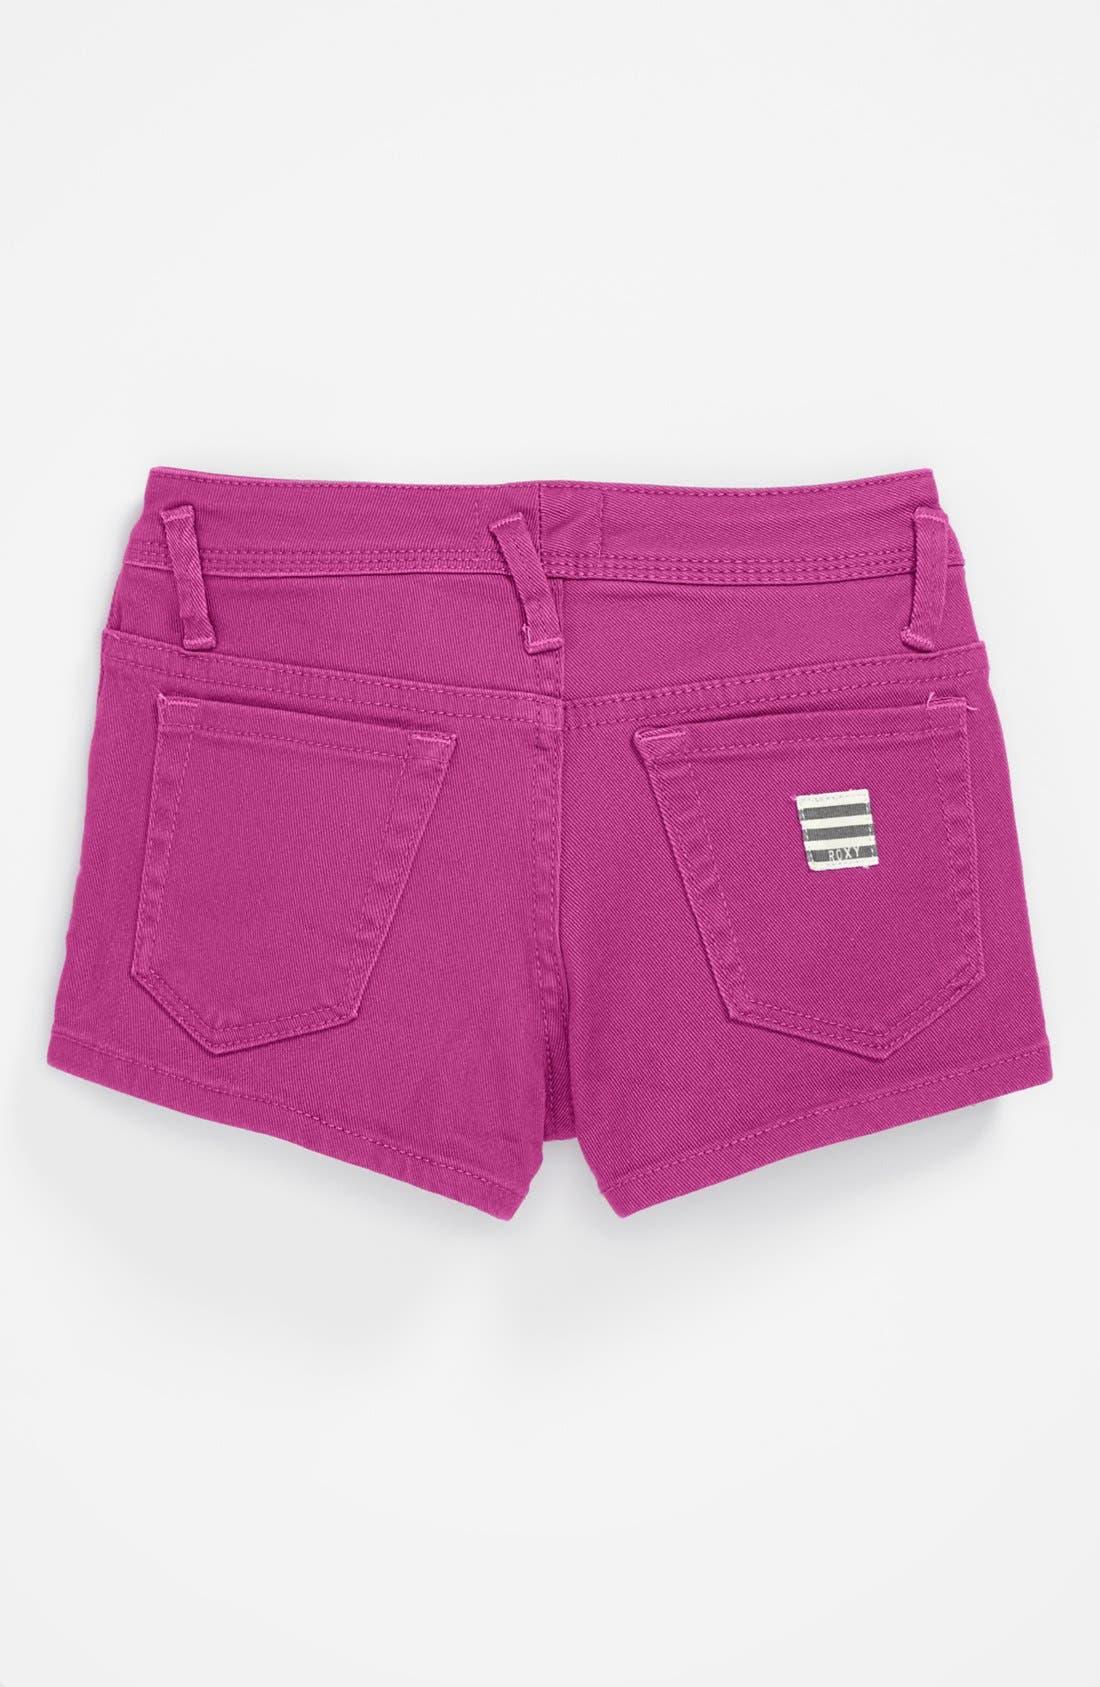 Alternate Image 1 Selected - Roxy 'Ferris Wheel' Denim Shorts (Big Girls)